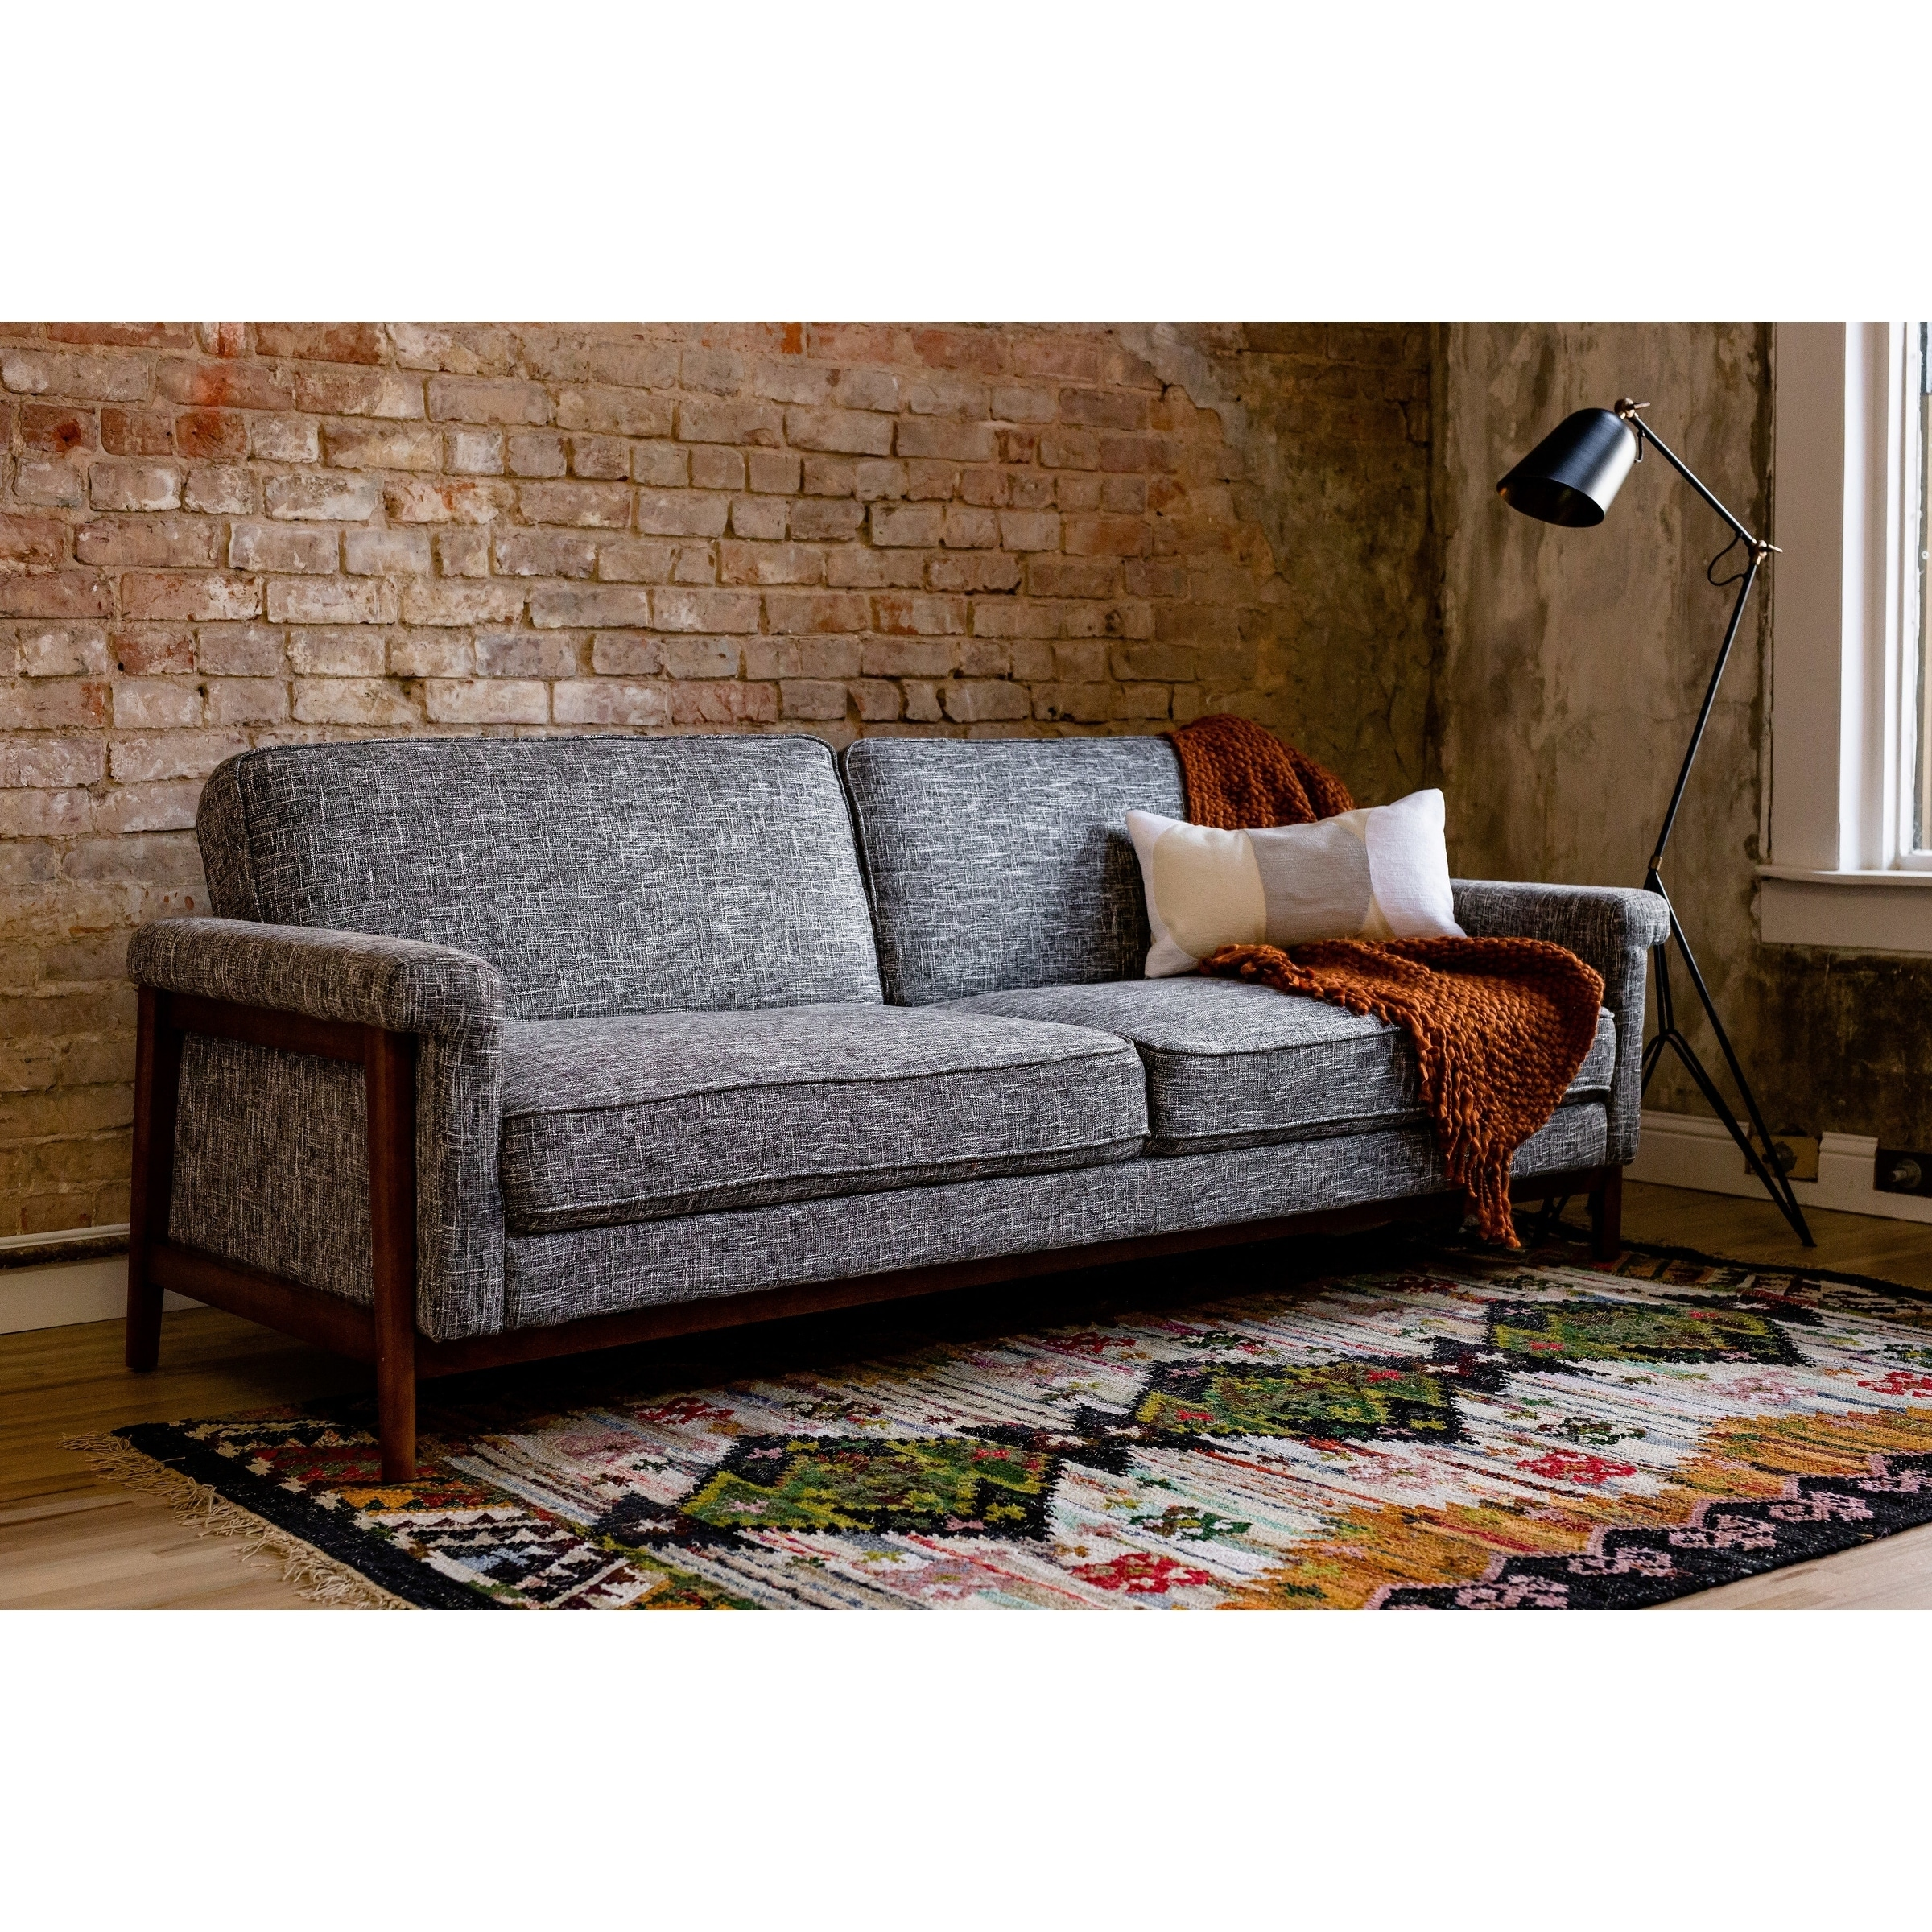 Ainsley Mid-Century Modern Grey Upholstered Sleeper Sofa